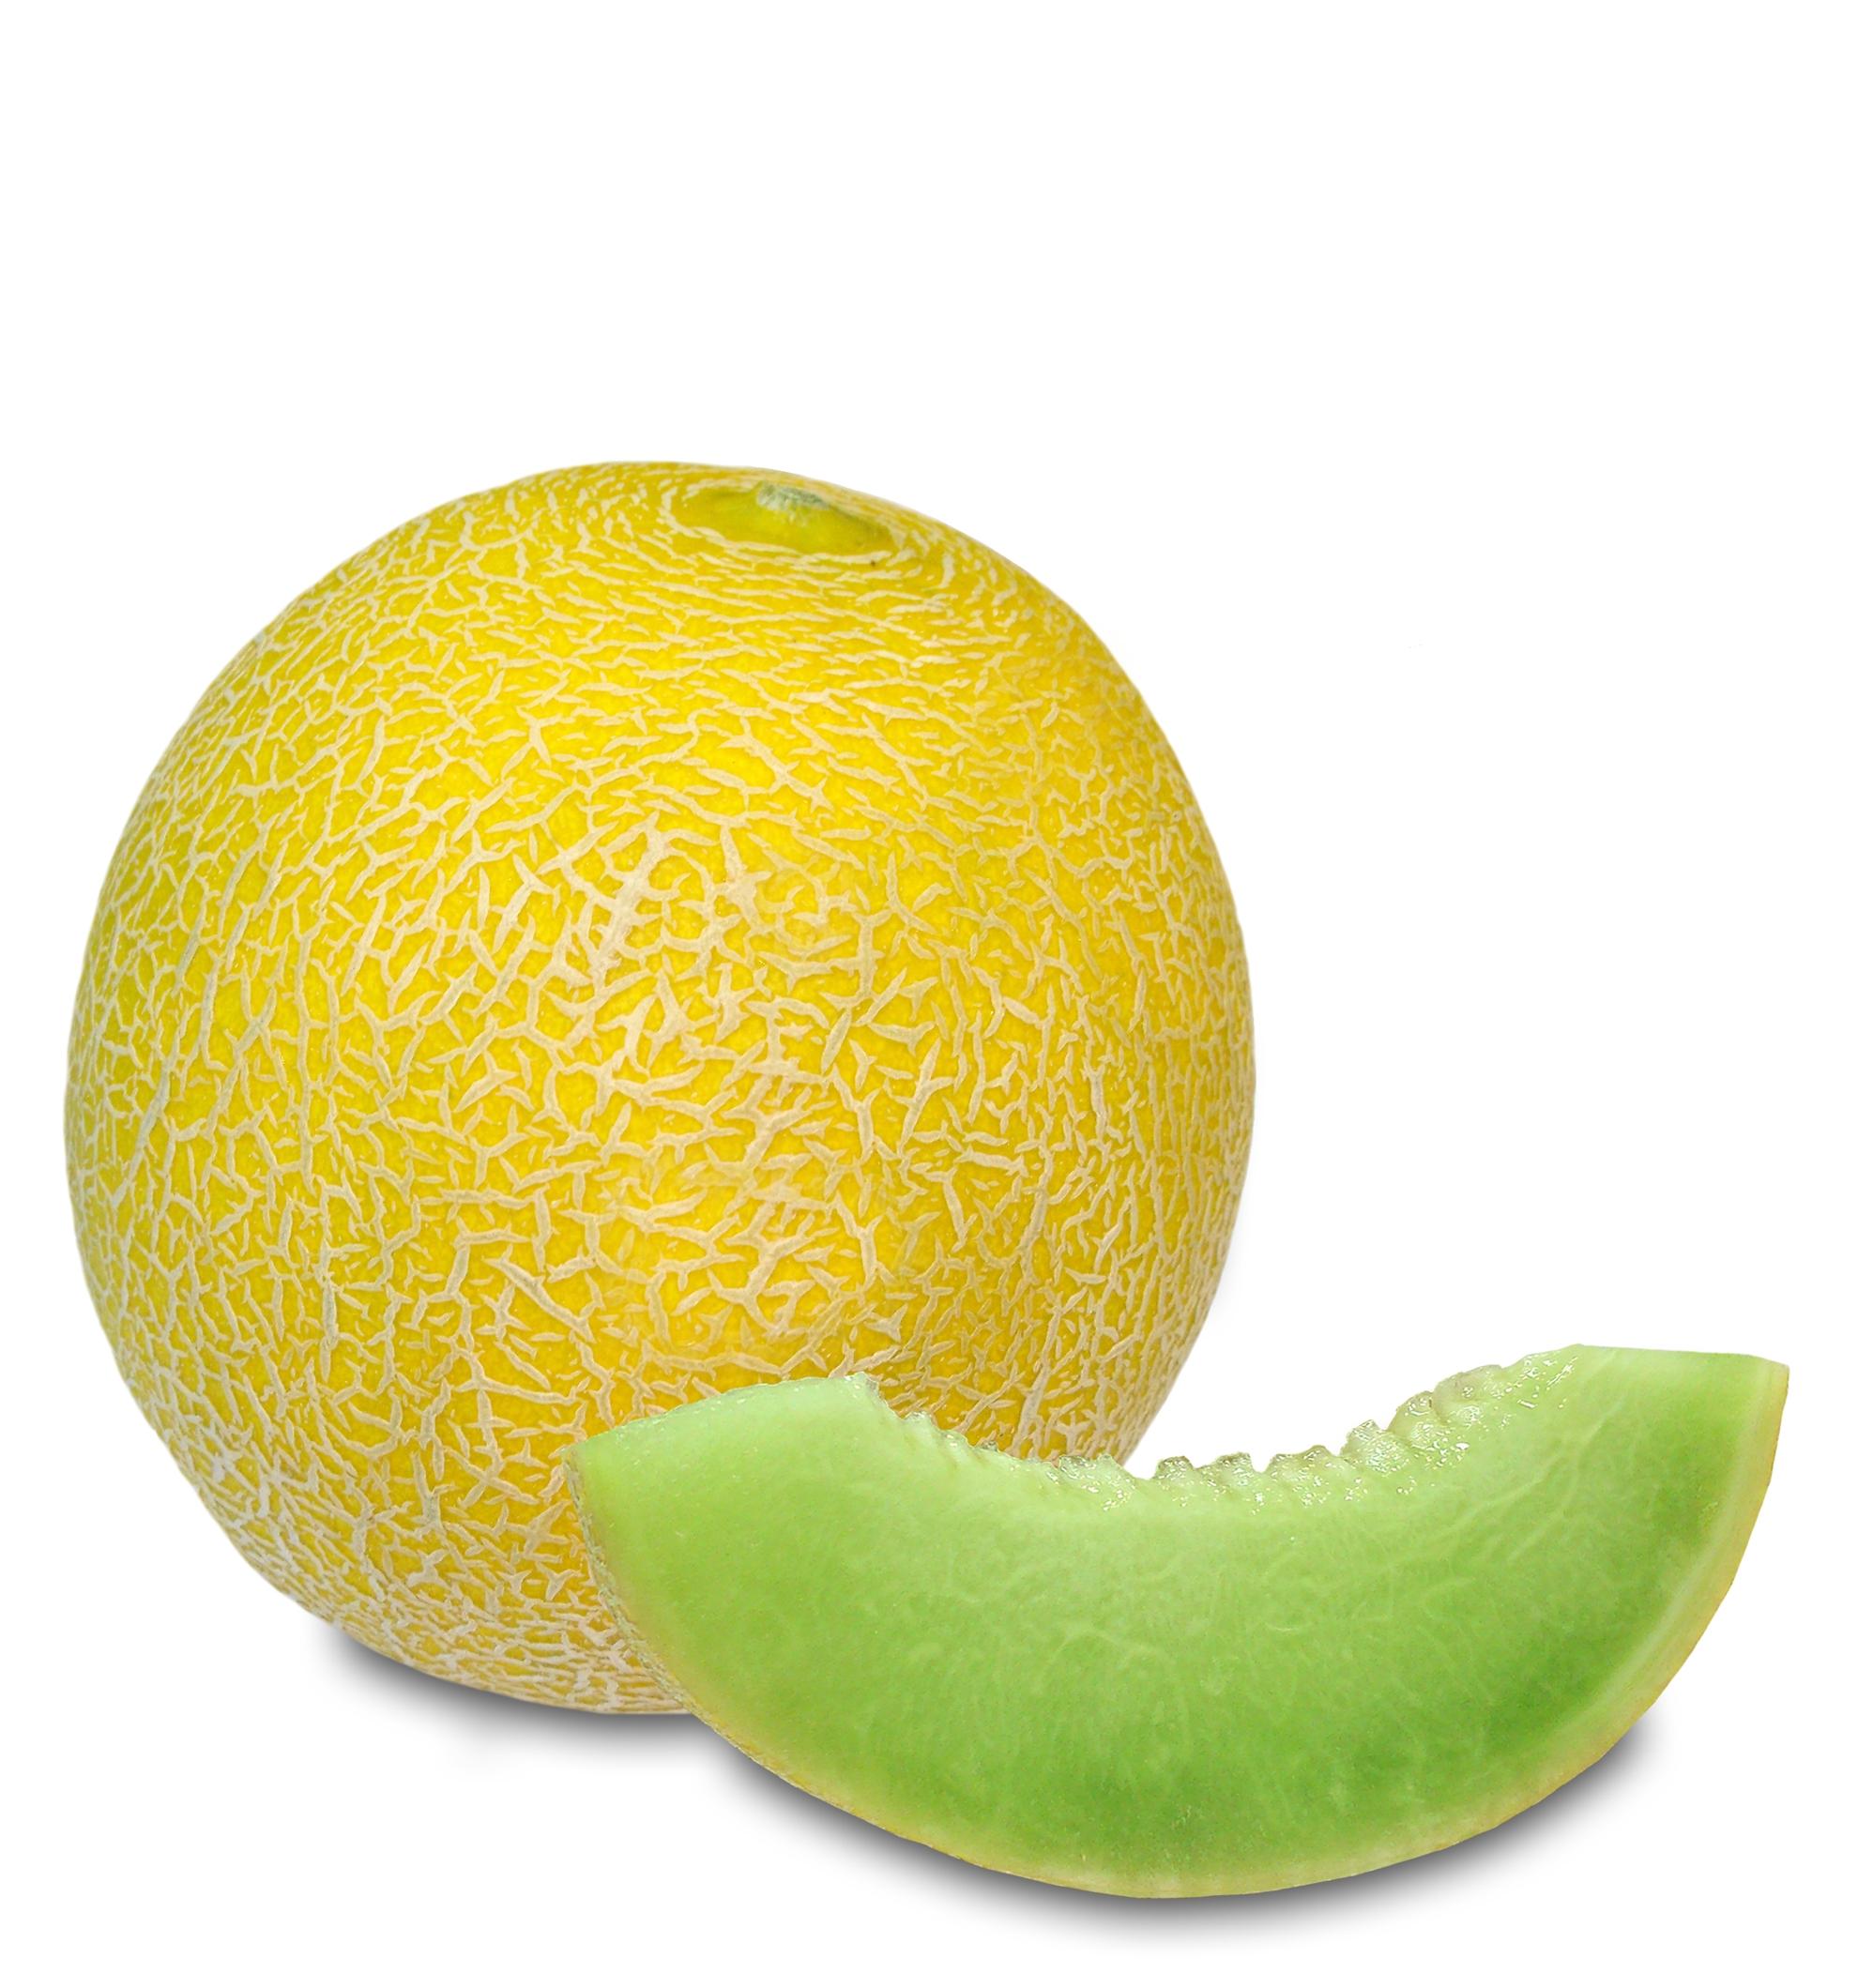 Okashi melon